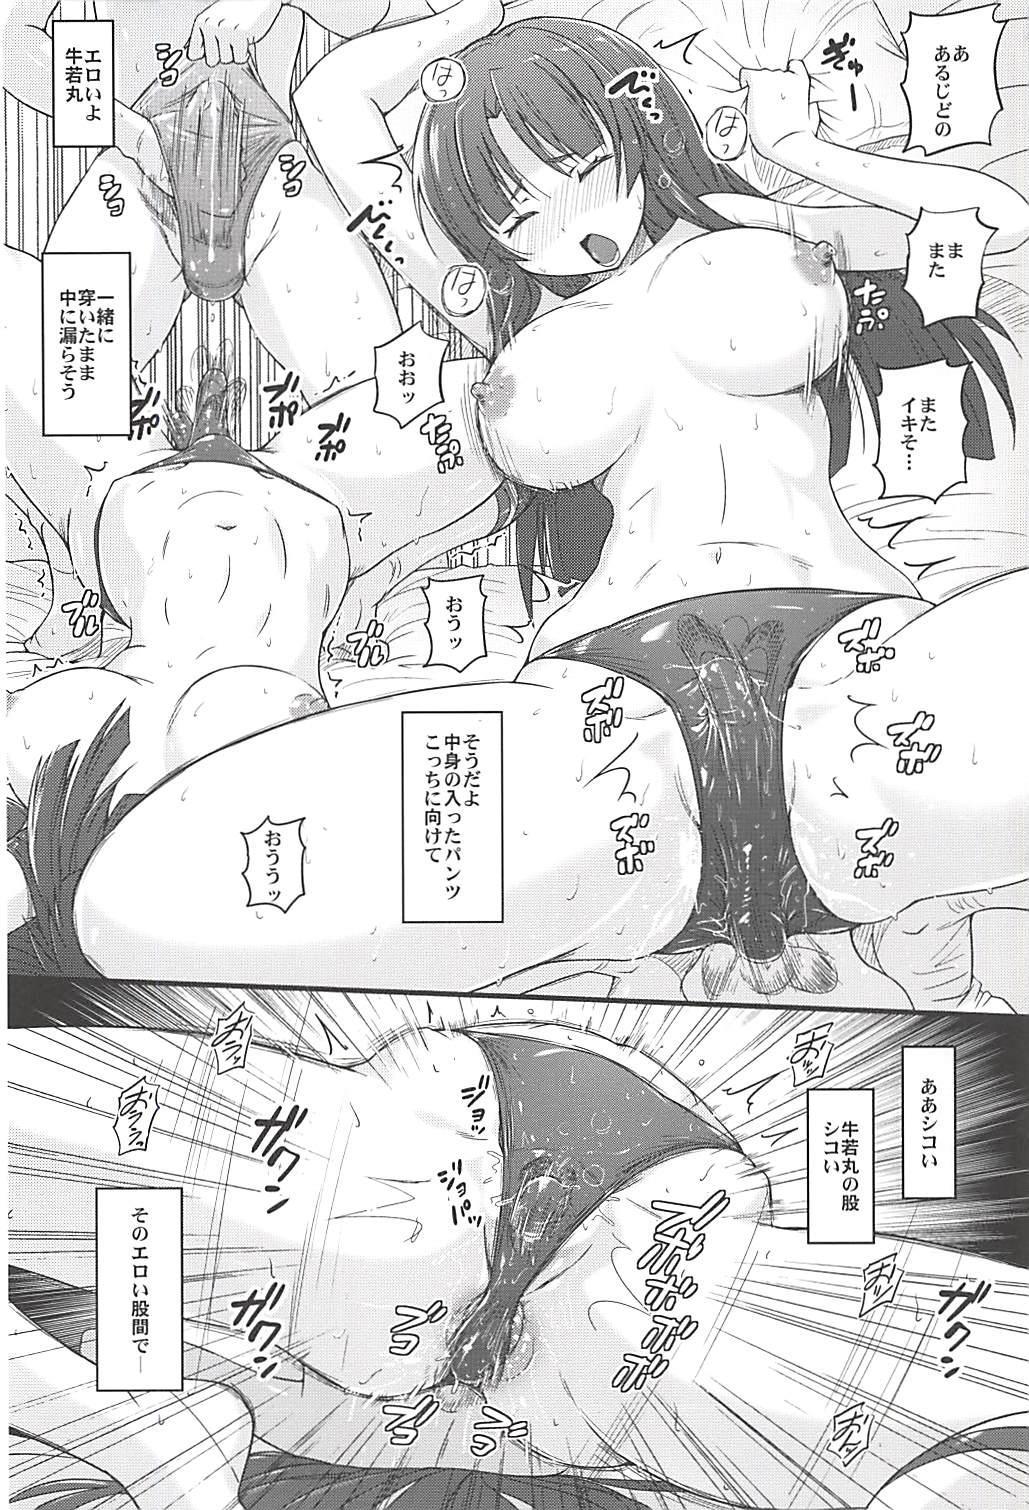 Ushiwakamaru no Pants 12